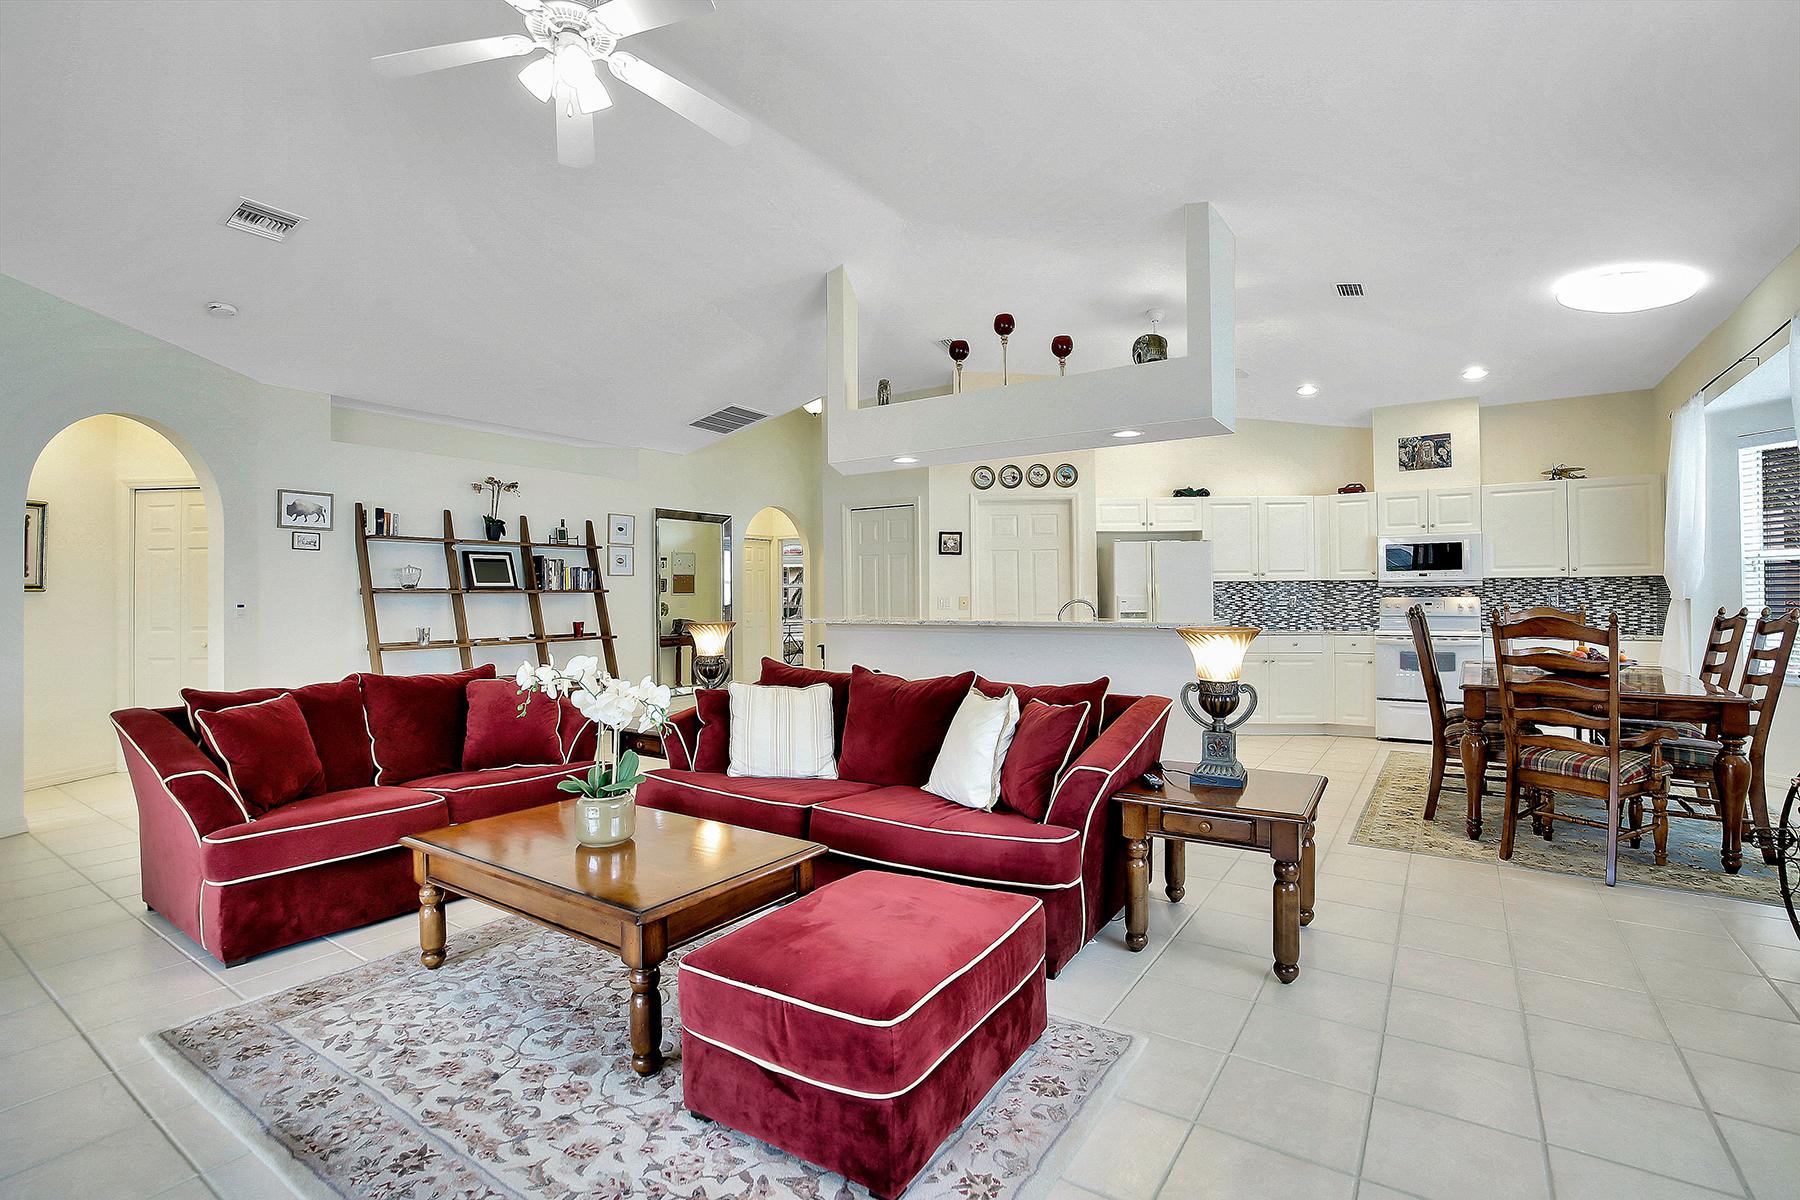 獨棟家庭住宅 為 出售 在 PEPPERTREE POINTE - WATER'S EDGE 14450 Laguna Dr, Fort Myers, 佛羅里達州, 33908 美國